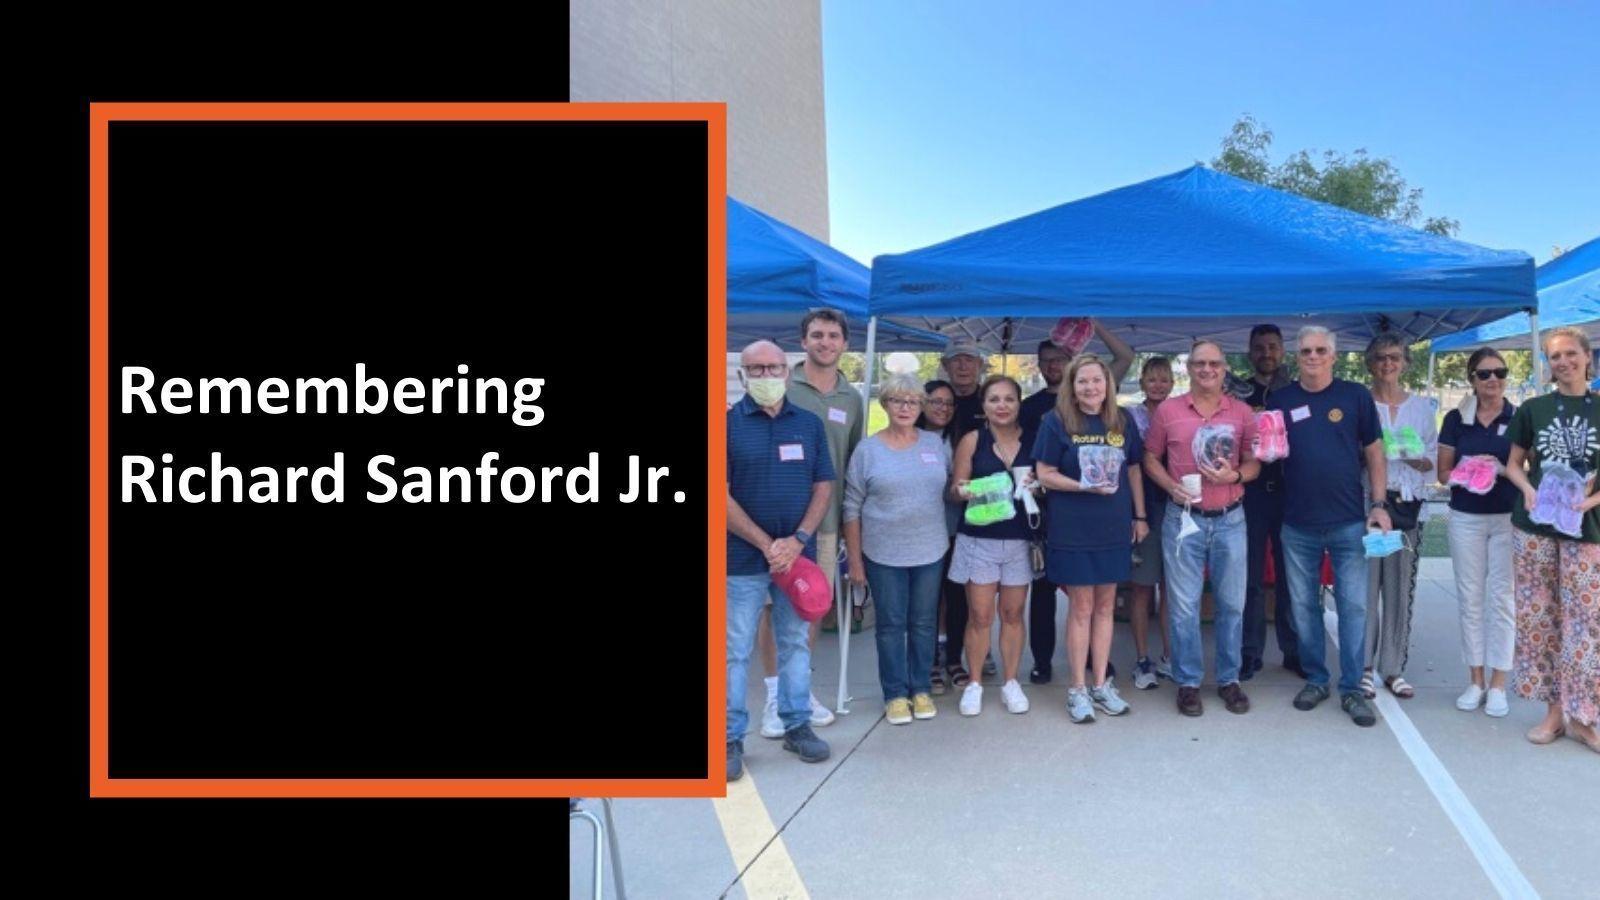 Remembering Richard Sanford Jr.